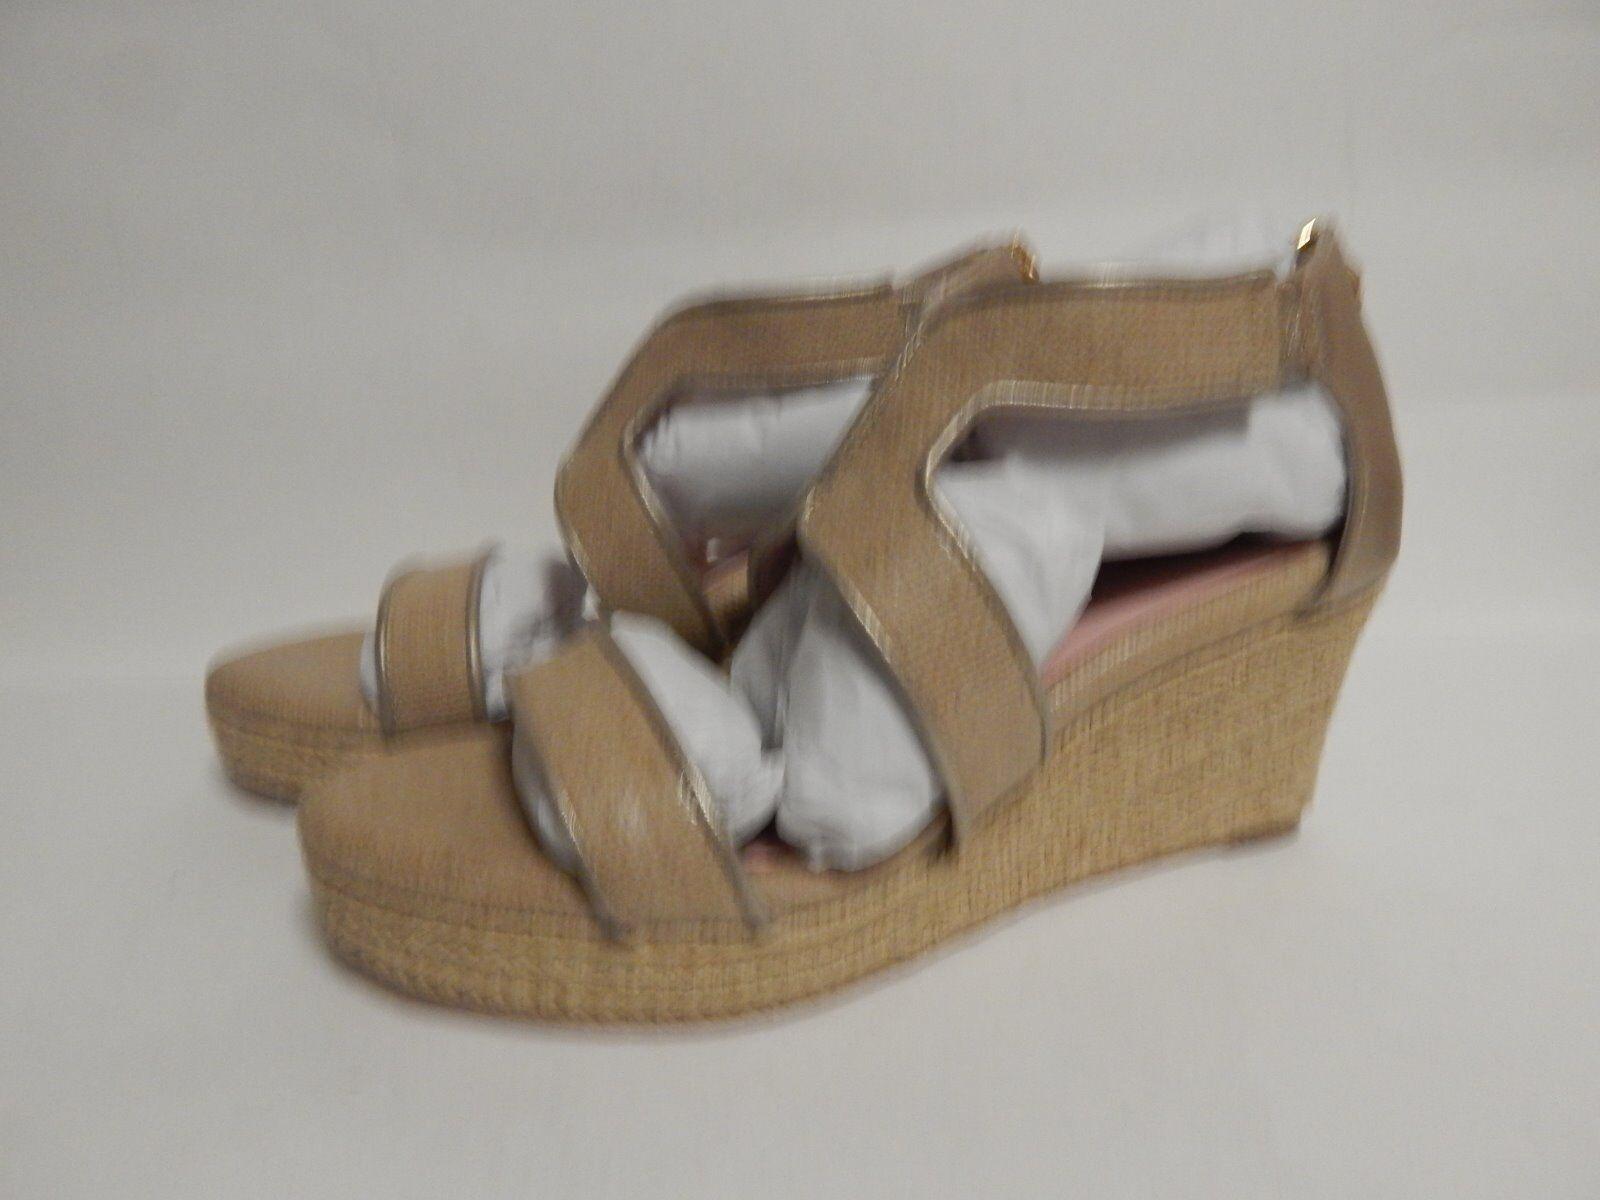 Taryn pink Karsen Wedge Sandal 5.5 M Nat gold CL  New with Box